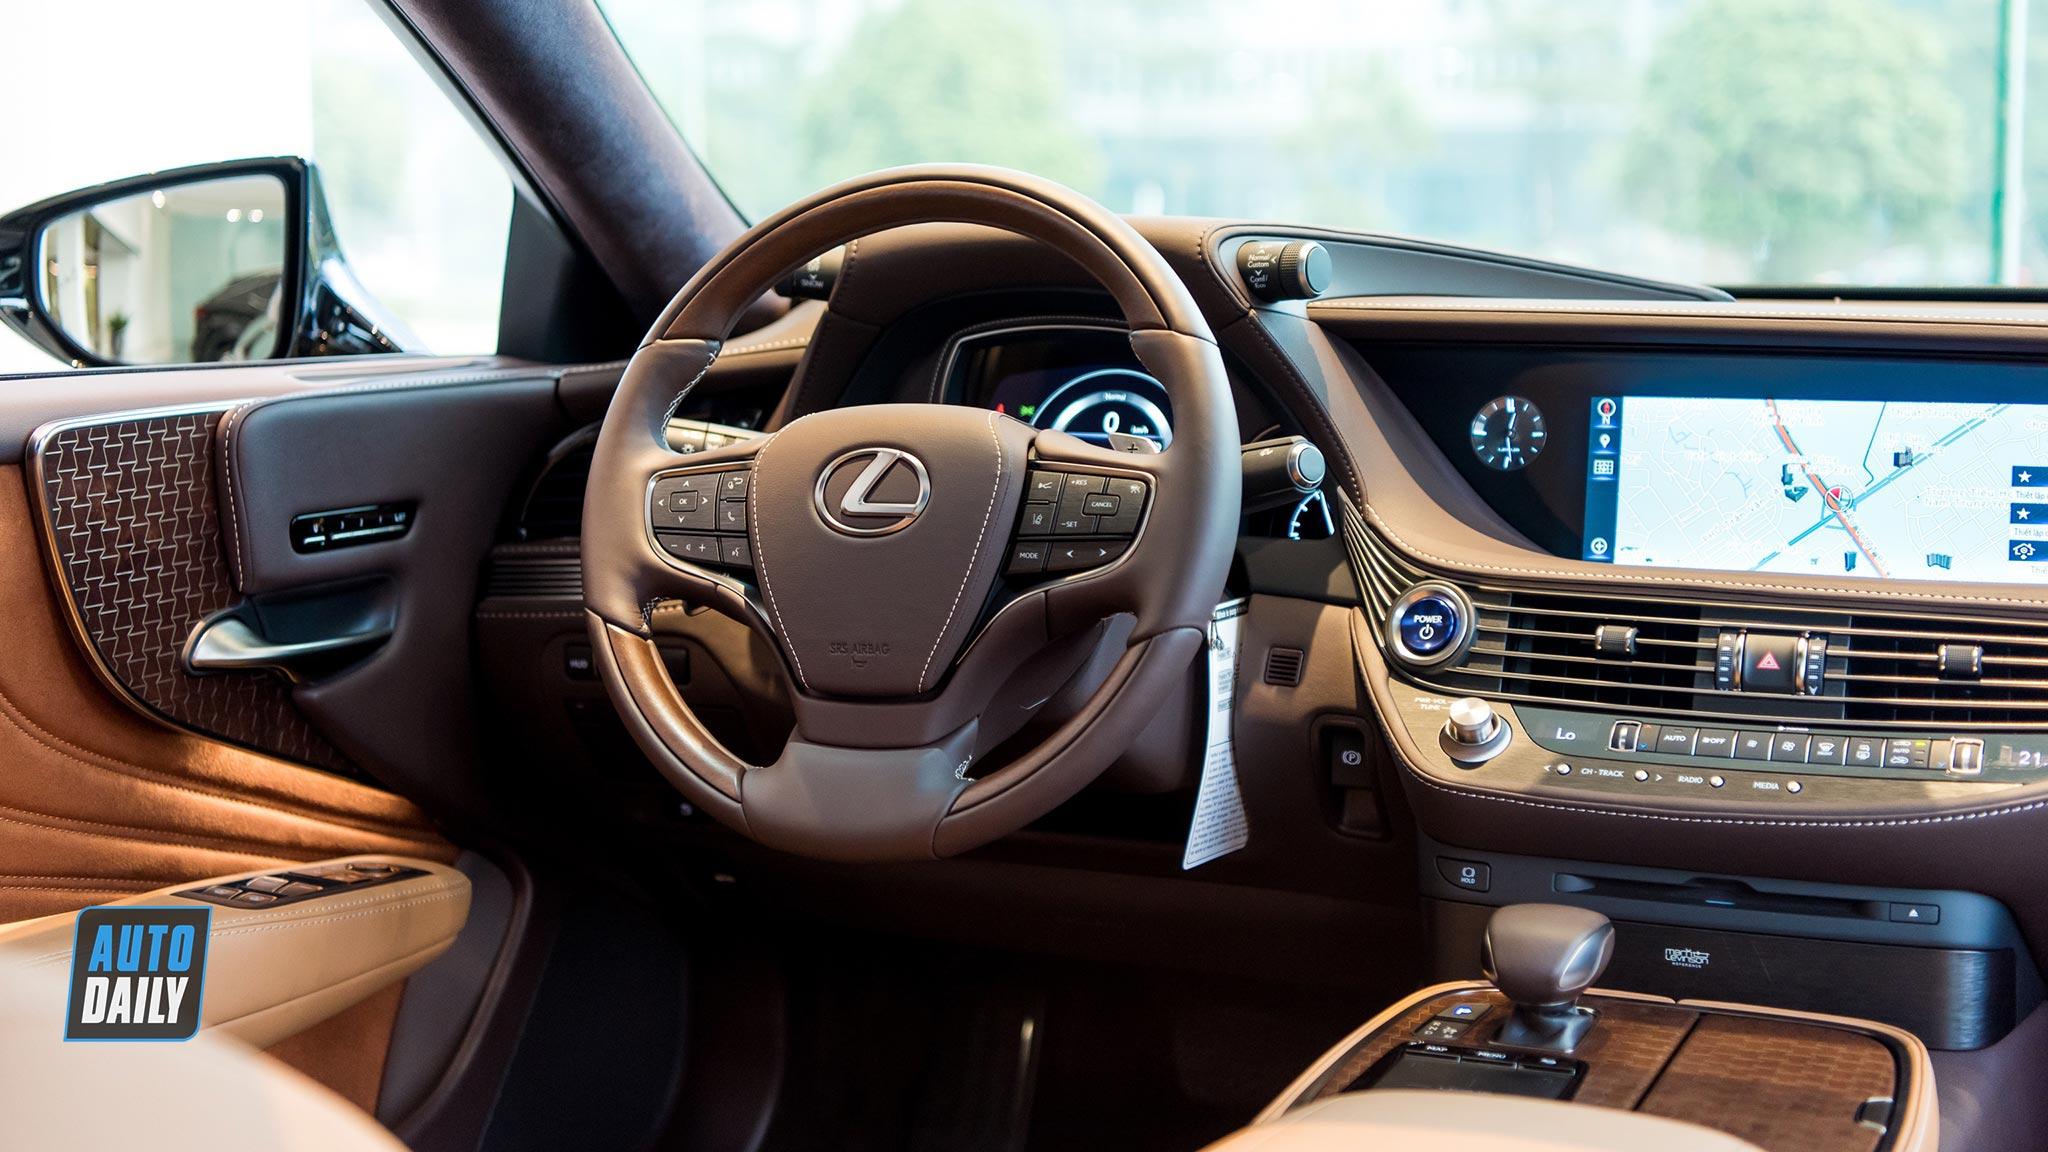 lexus-ls500h-autodaily-046.jpg